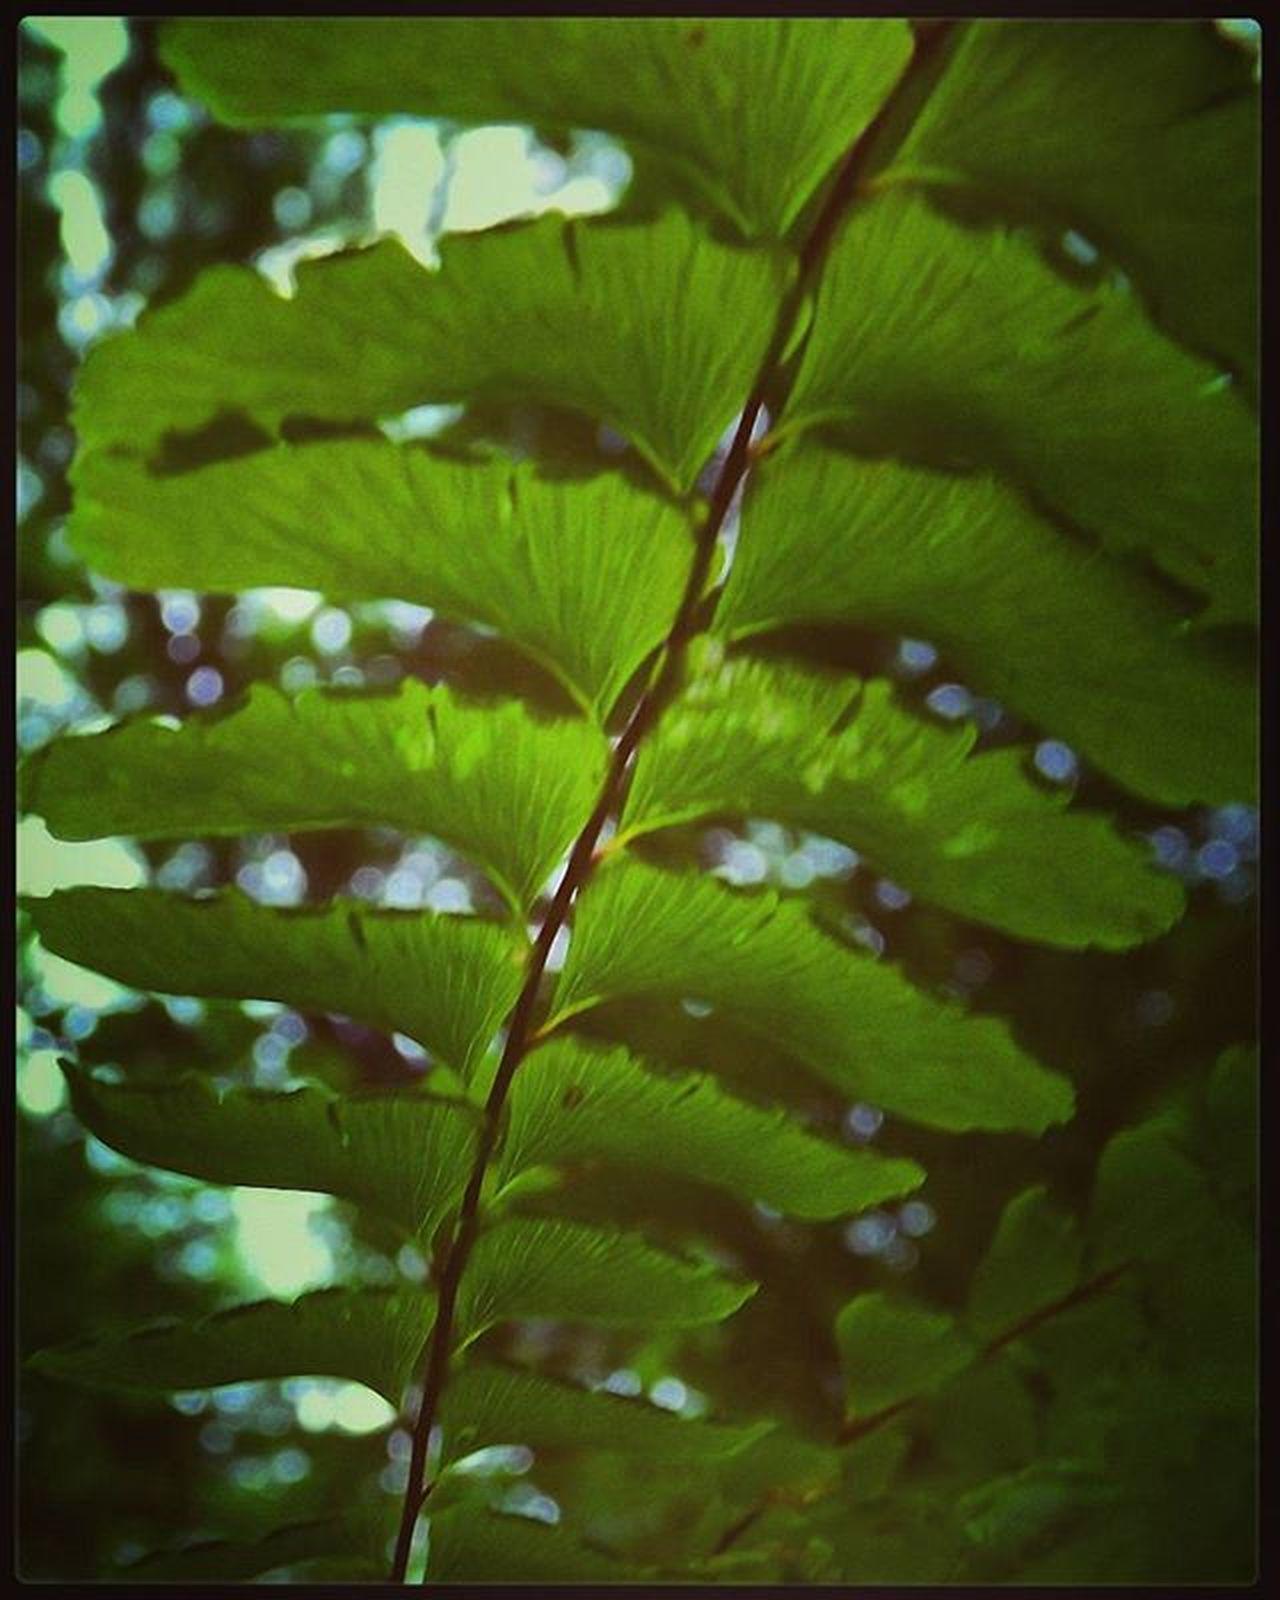 Sunshine on a maidenhair (fern) Forestfriend Nativeplants Kentuckyoutdoors Wildernessculture Woodlandplants AppalachianMountains Godsgarden Woodlandwonders Maidenhairfern SecretGardens Kyphotographer Kentuckyoutdoors Kyscenery Kywildinthewoods